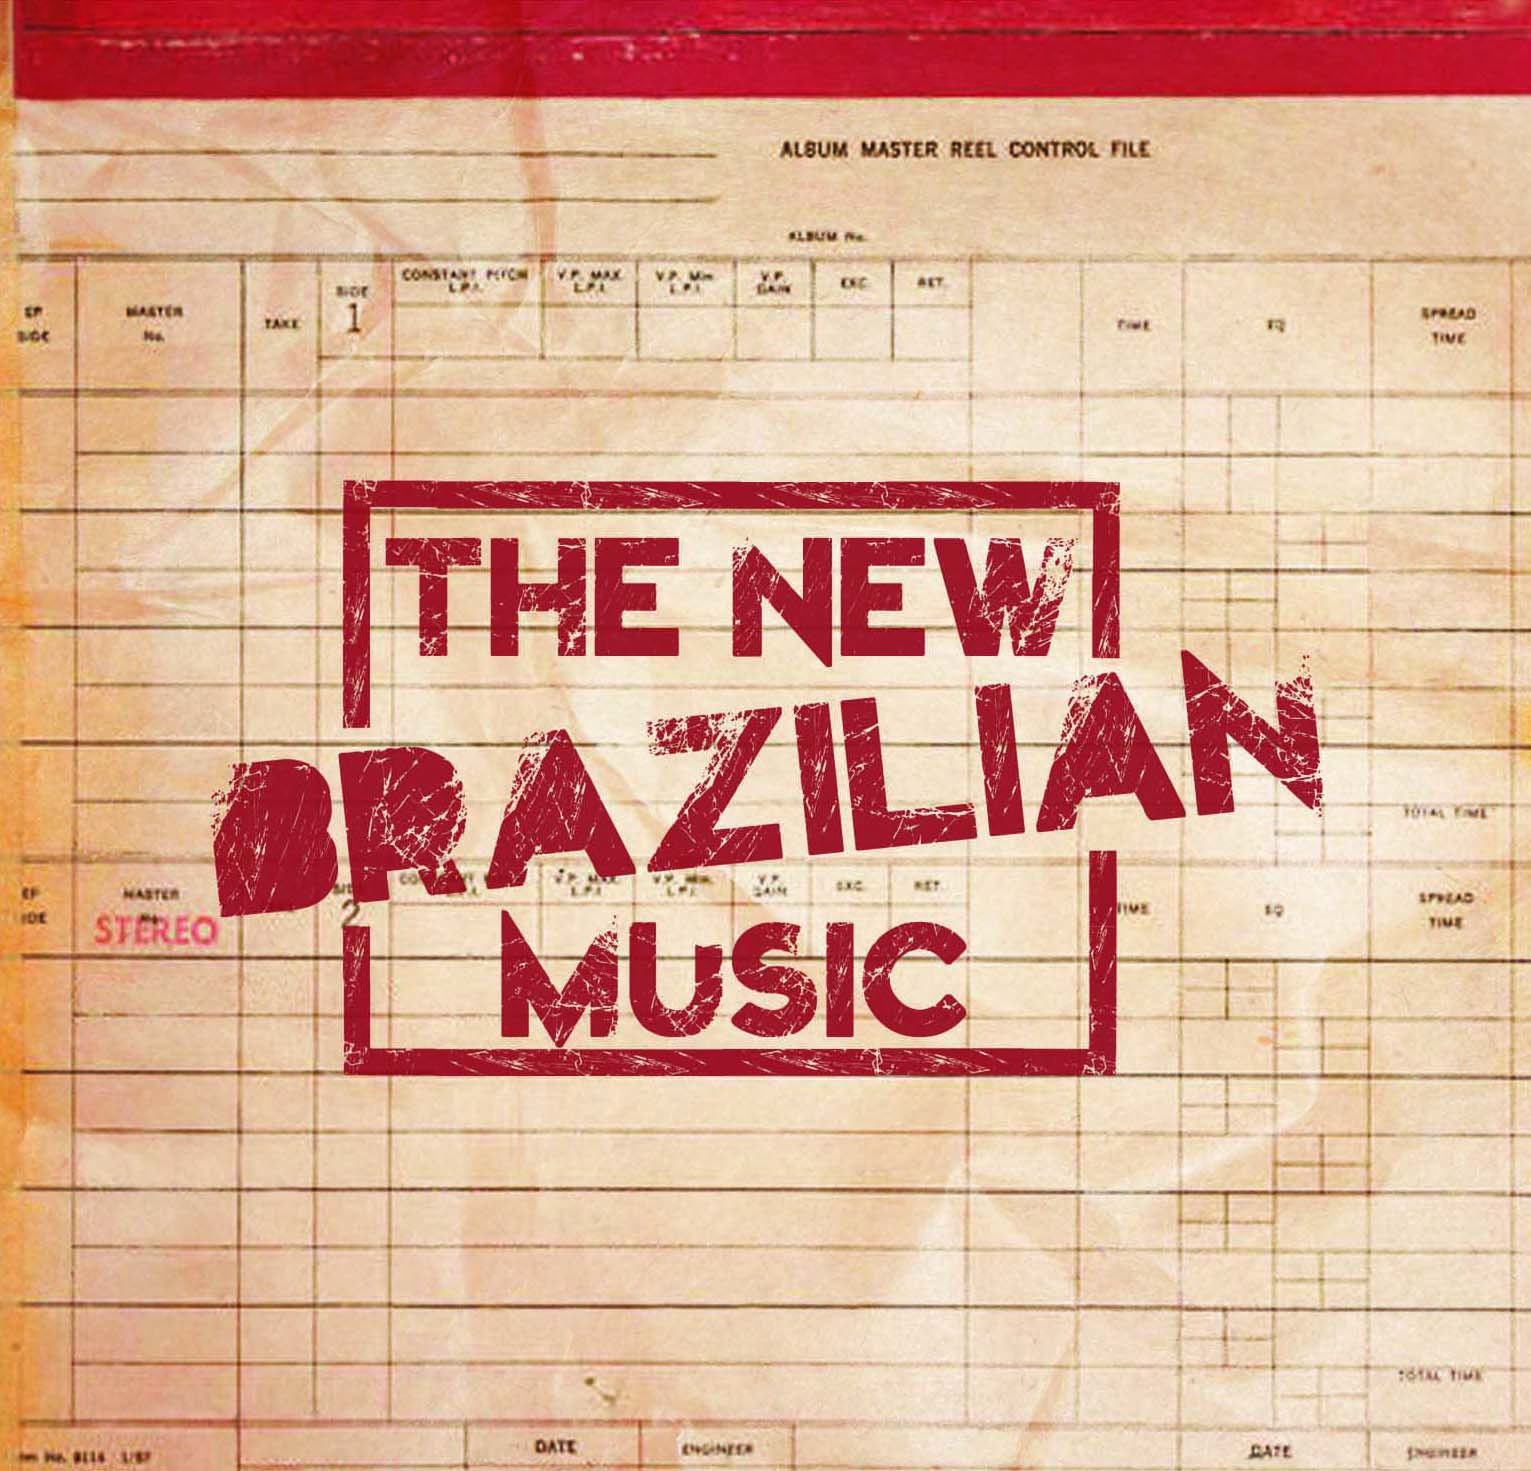 41 2011 The New Brazilian Music Vol 4.jpg